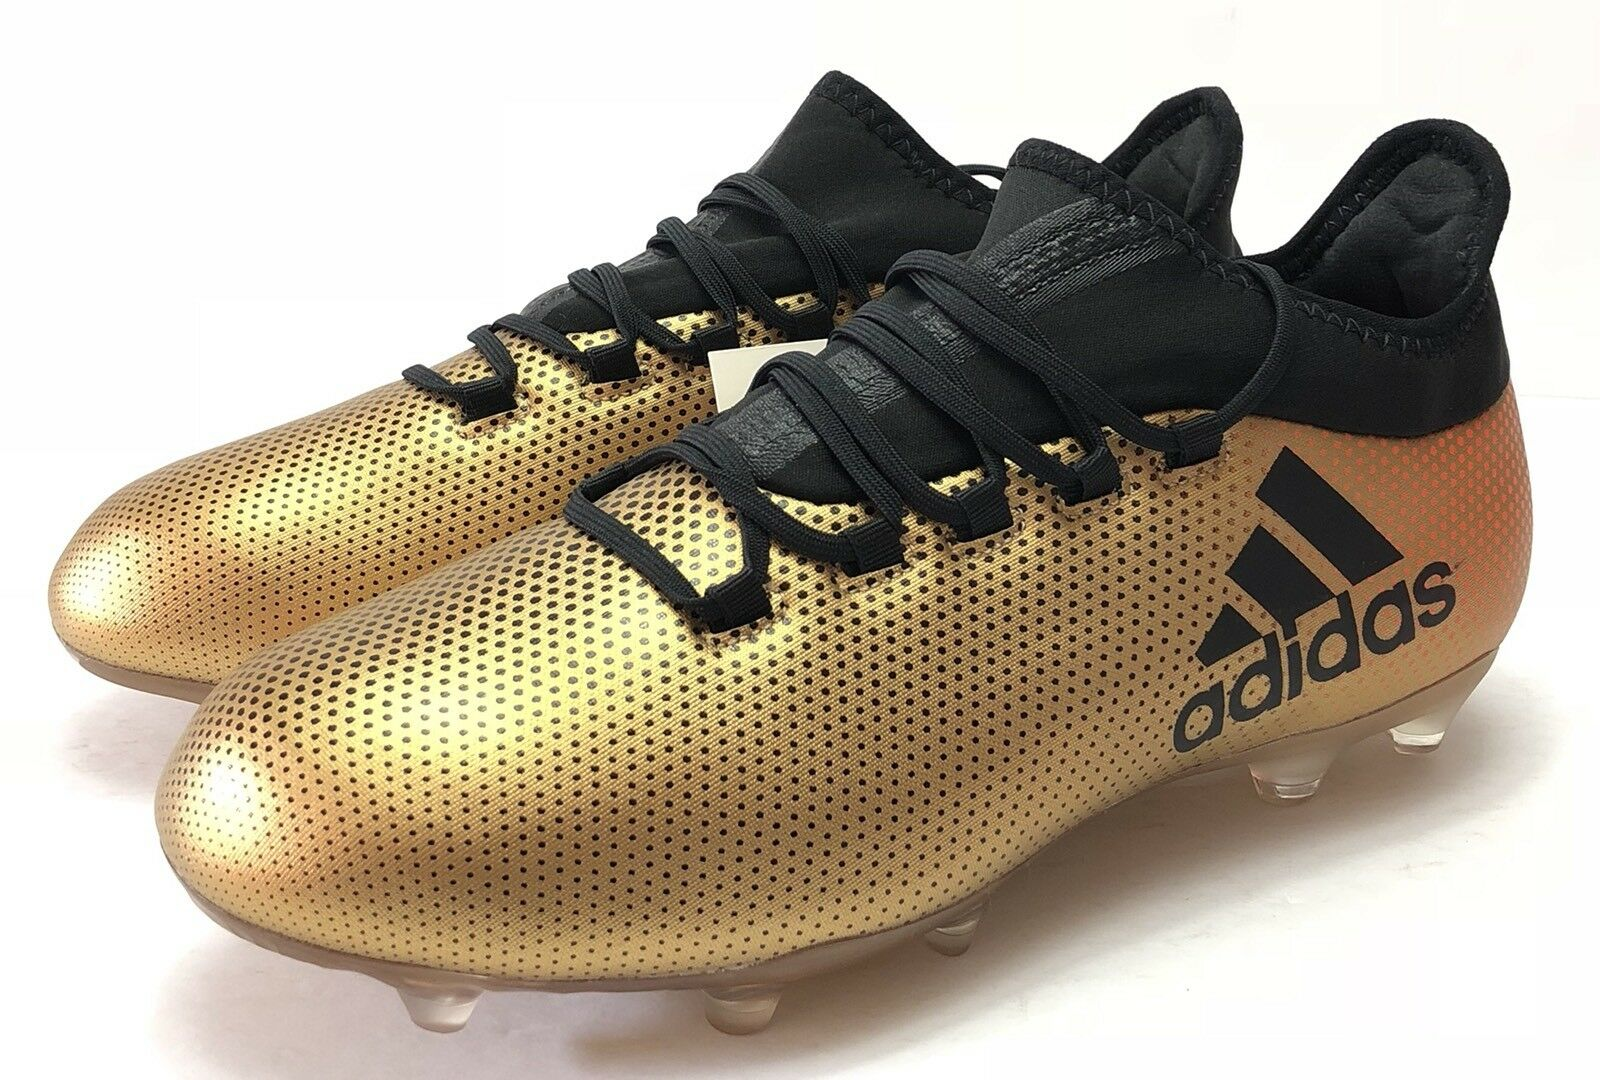 NEW Adidas X 17.2 FG Uomo Soccer Cleats Stivali Football CP9186 Gold Nero Size 8